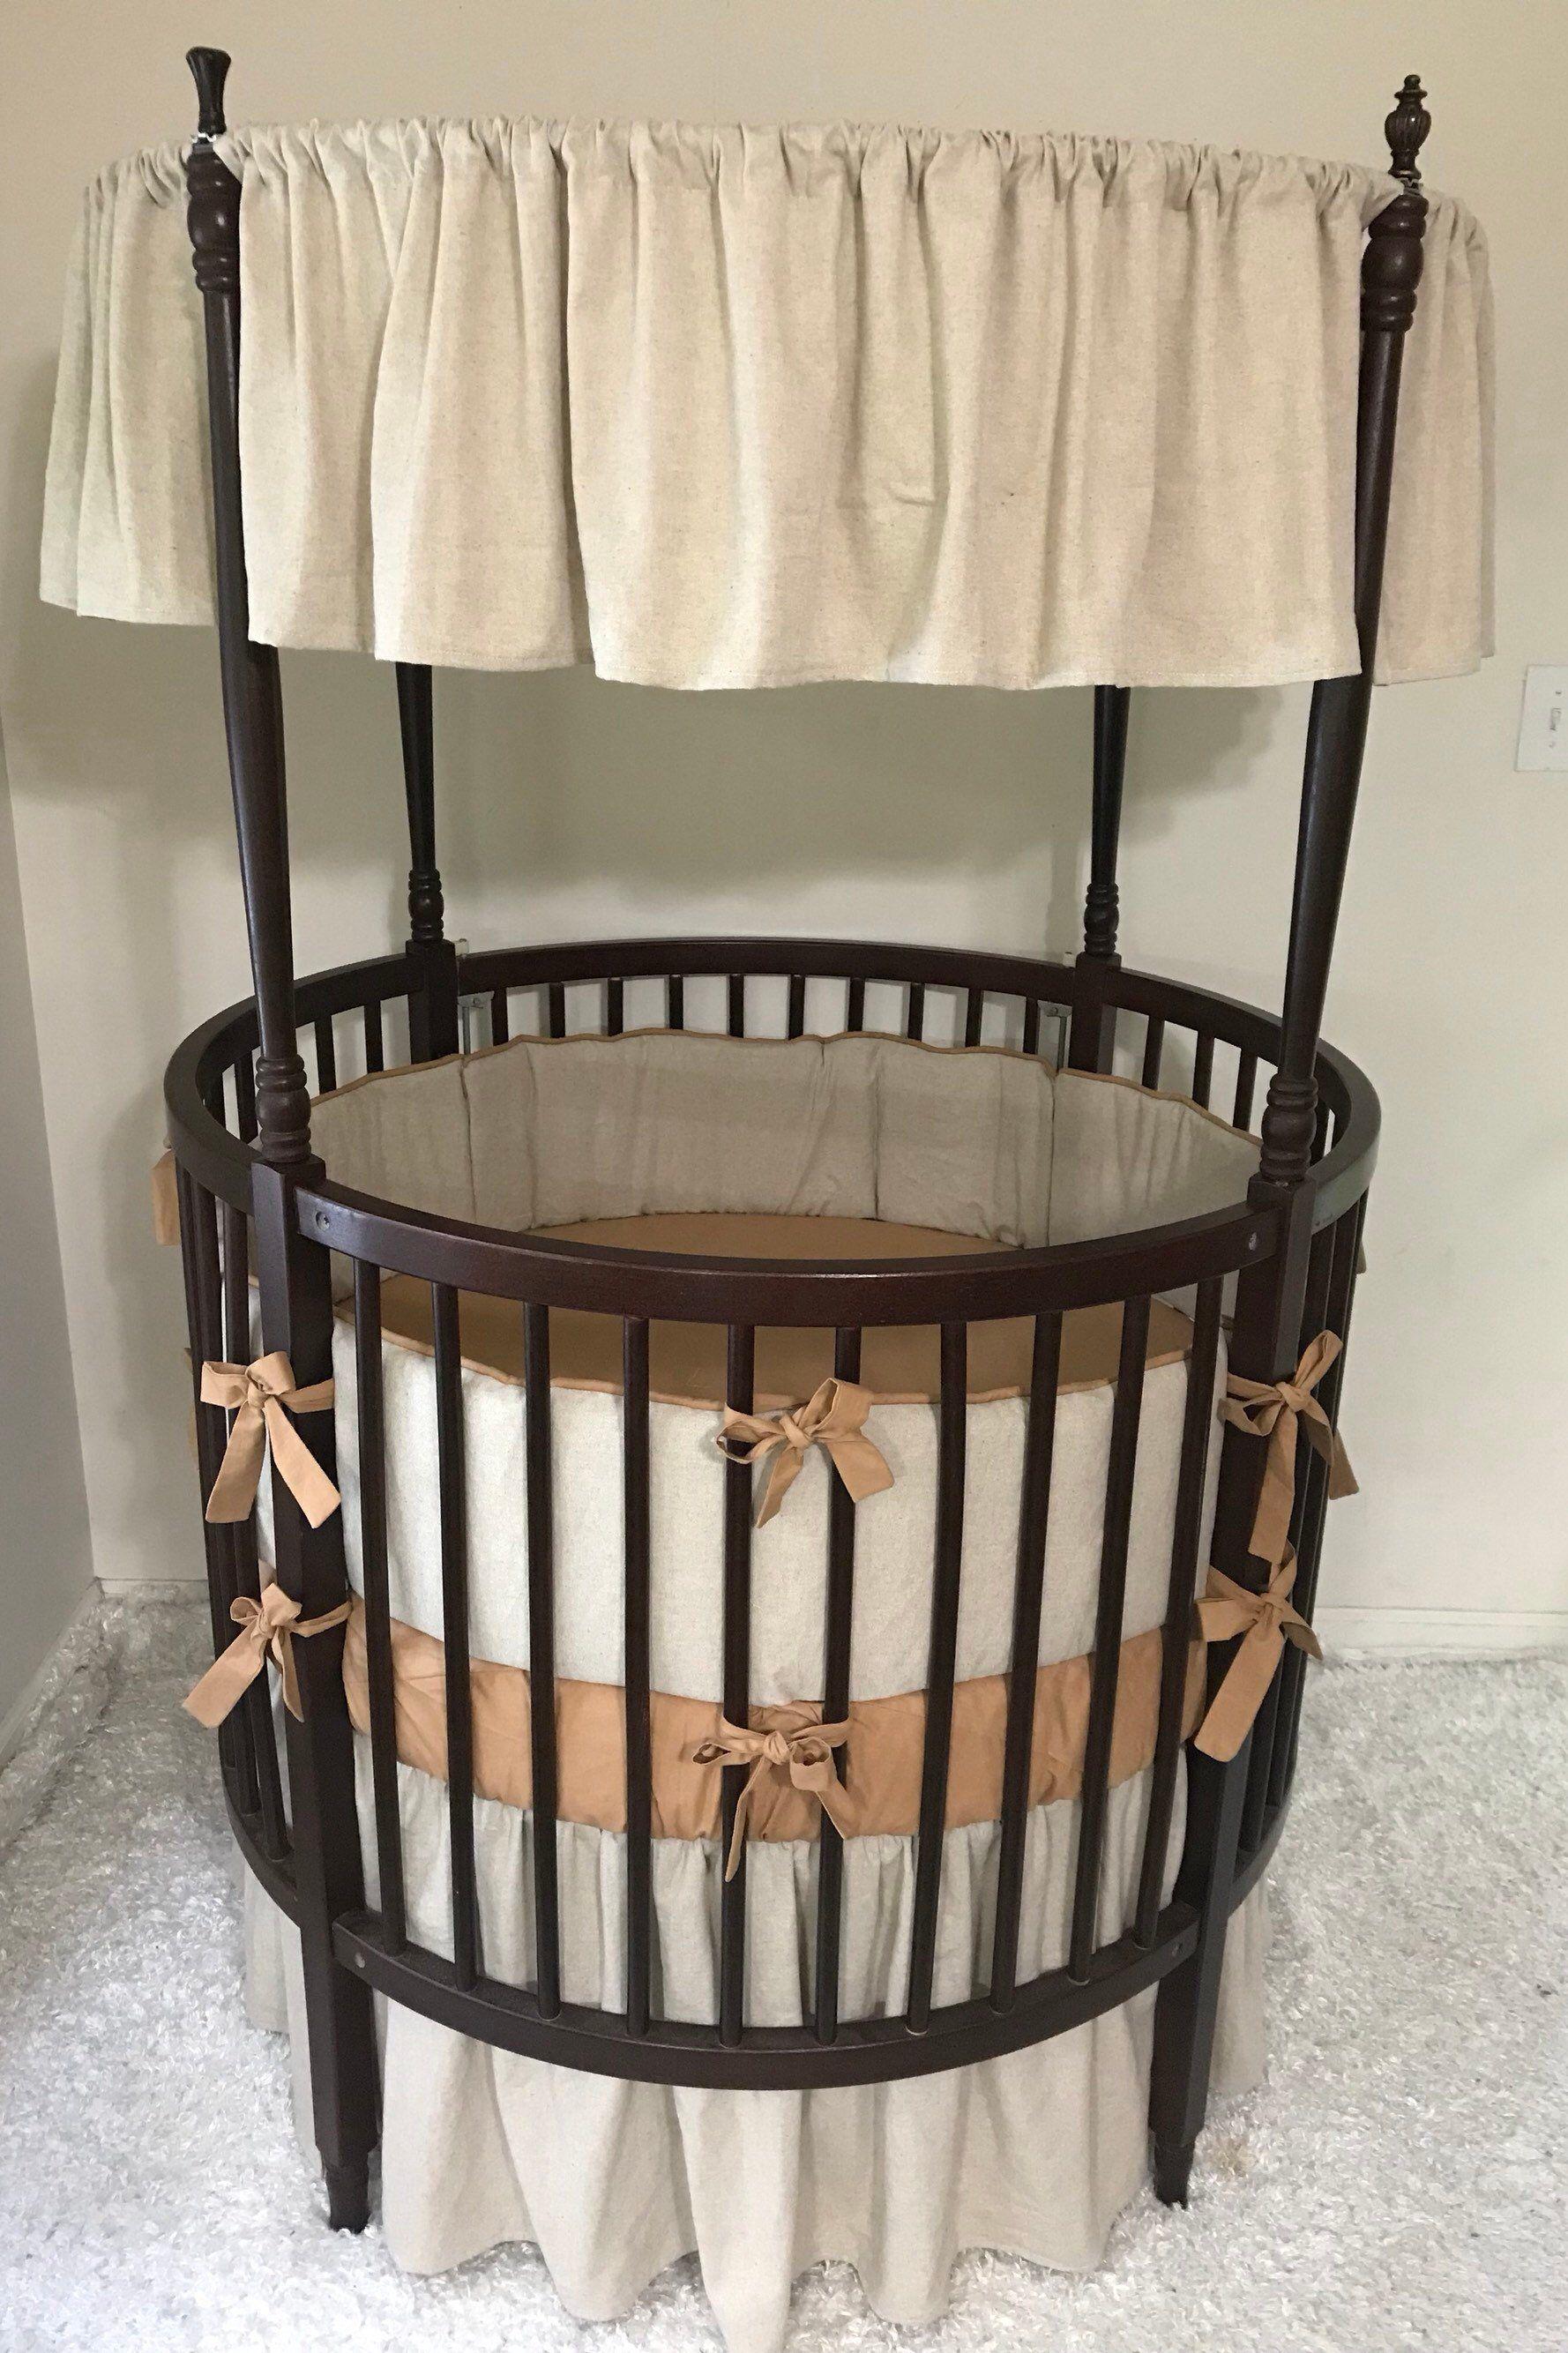 Baby Bedding Round Crib Set Linen Coffee Caramel Nutmeg Ships Fast